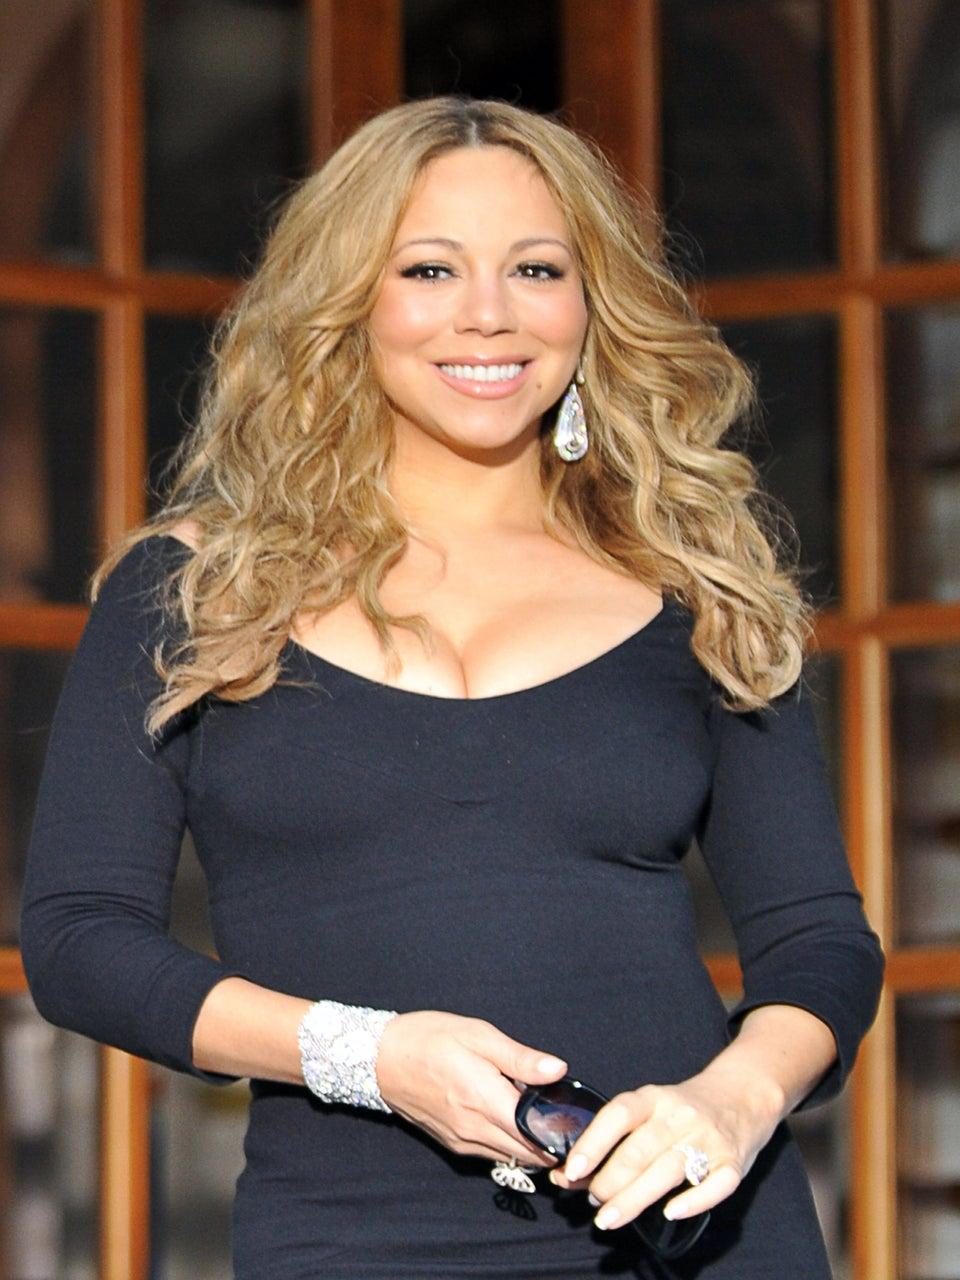 Coffee Talk: Mariah Carey to Kick-Off NFL Season with Live Performance